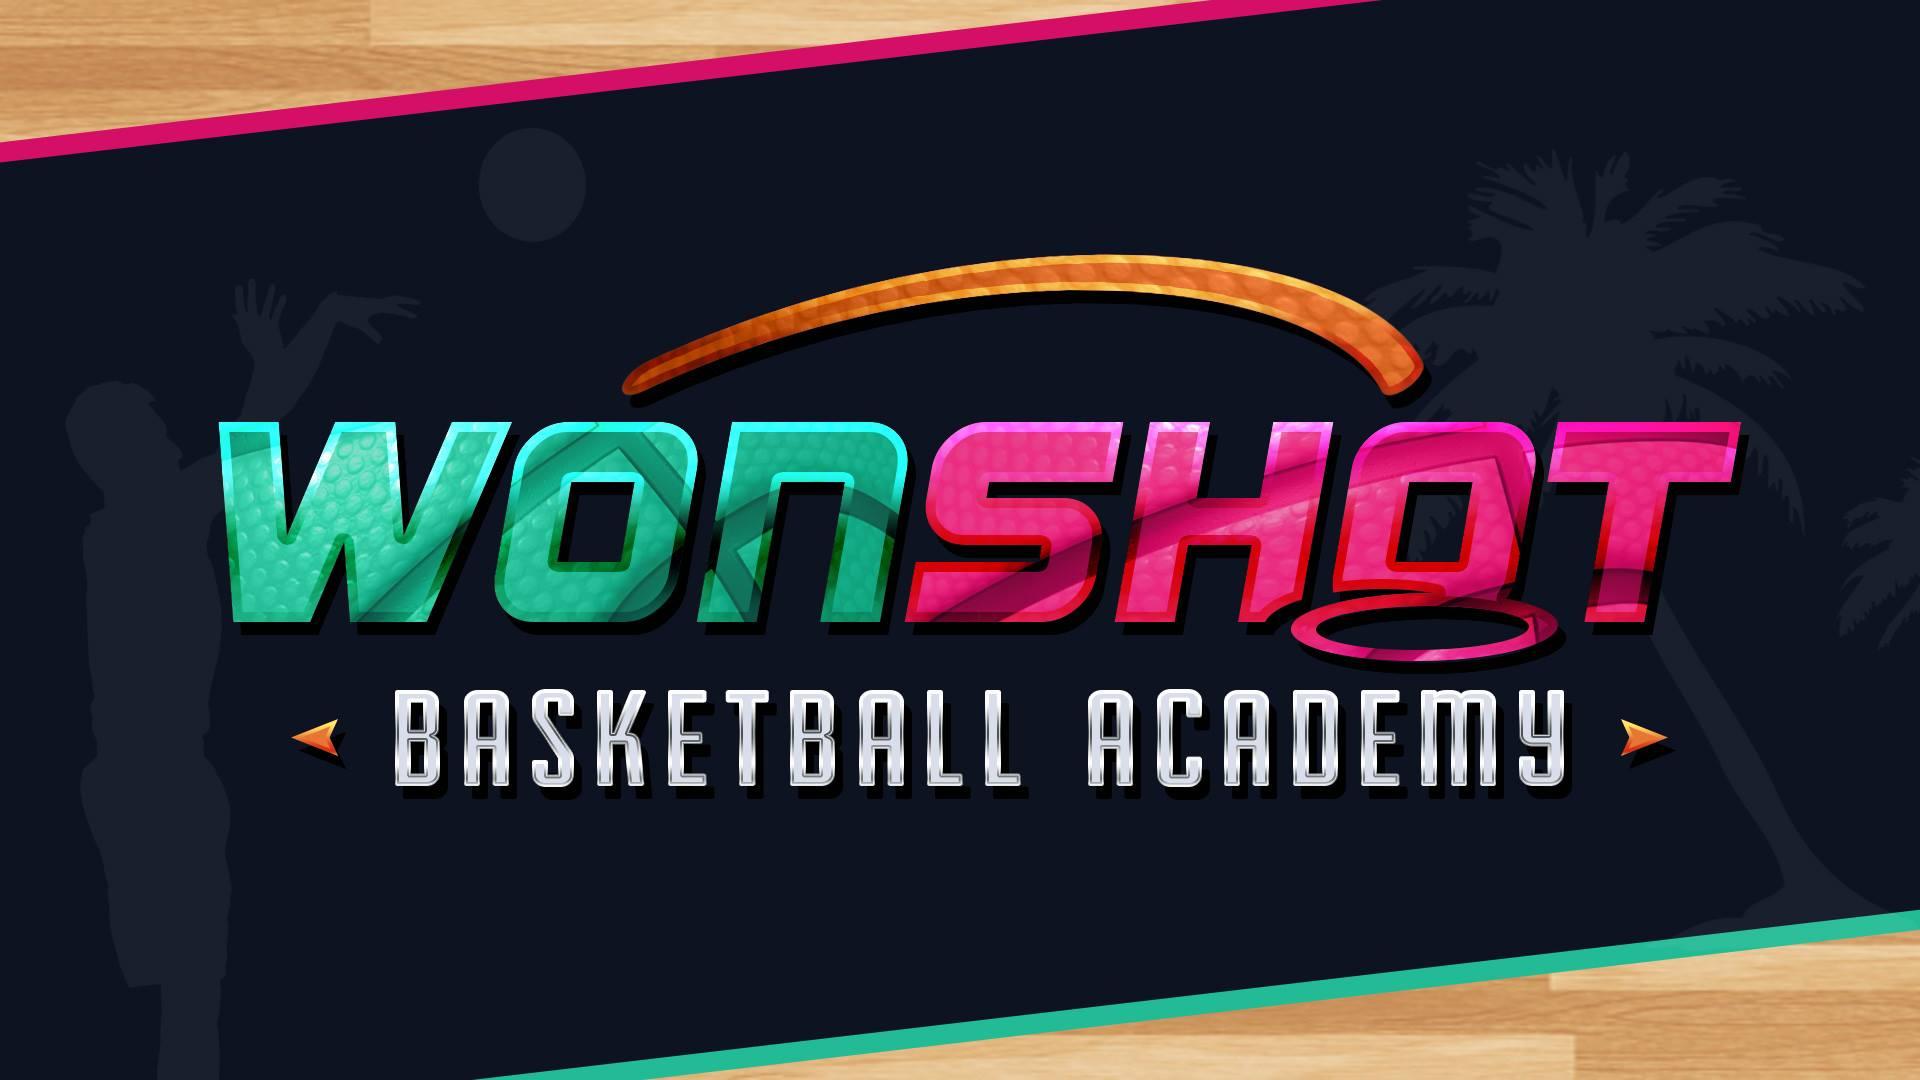 wonshot basketball academy logo .jpg